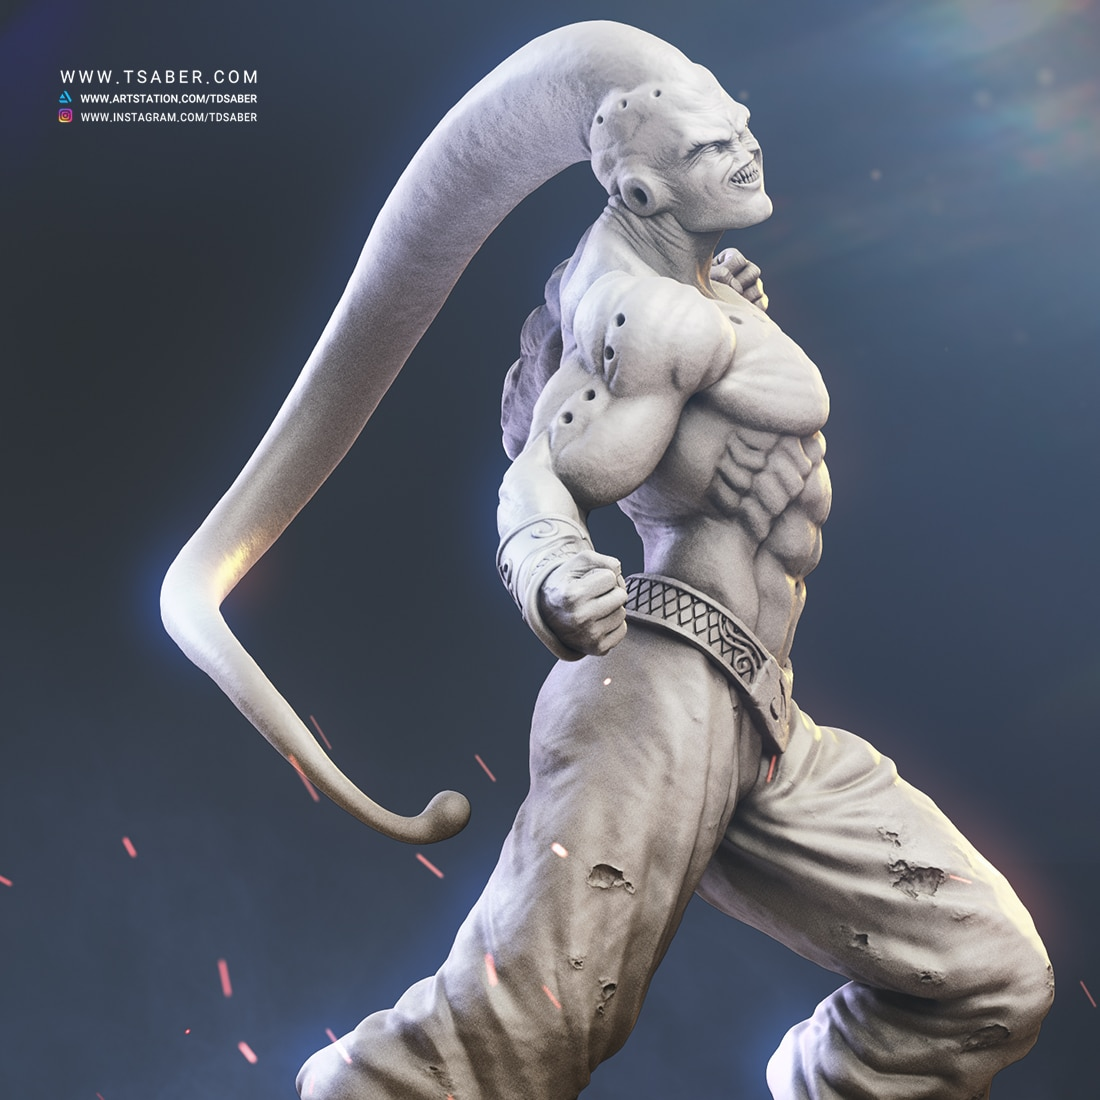 Majin Buu Zbrush statue Sculpture - Dragon Ball Z collectibles- Tsaber